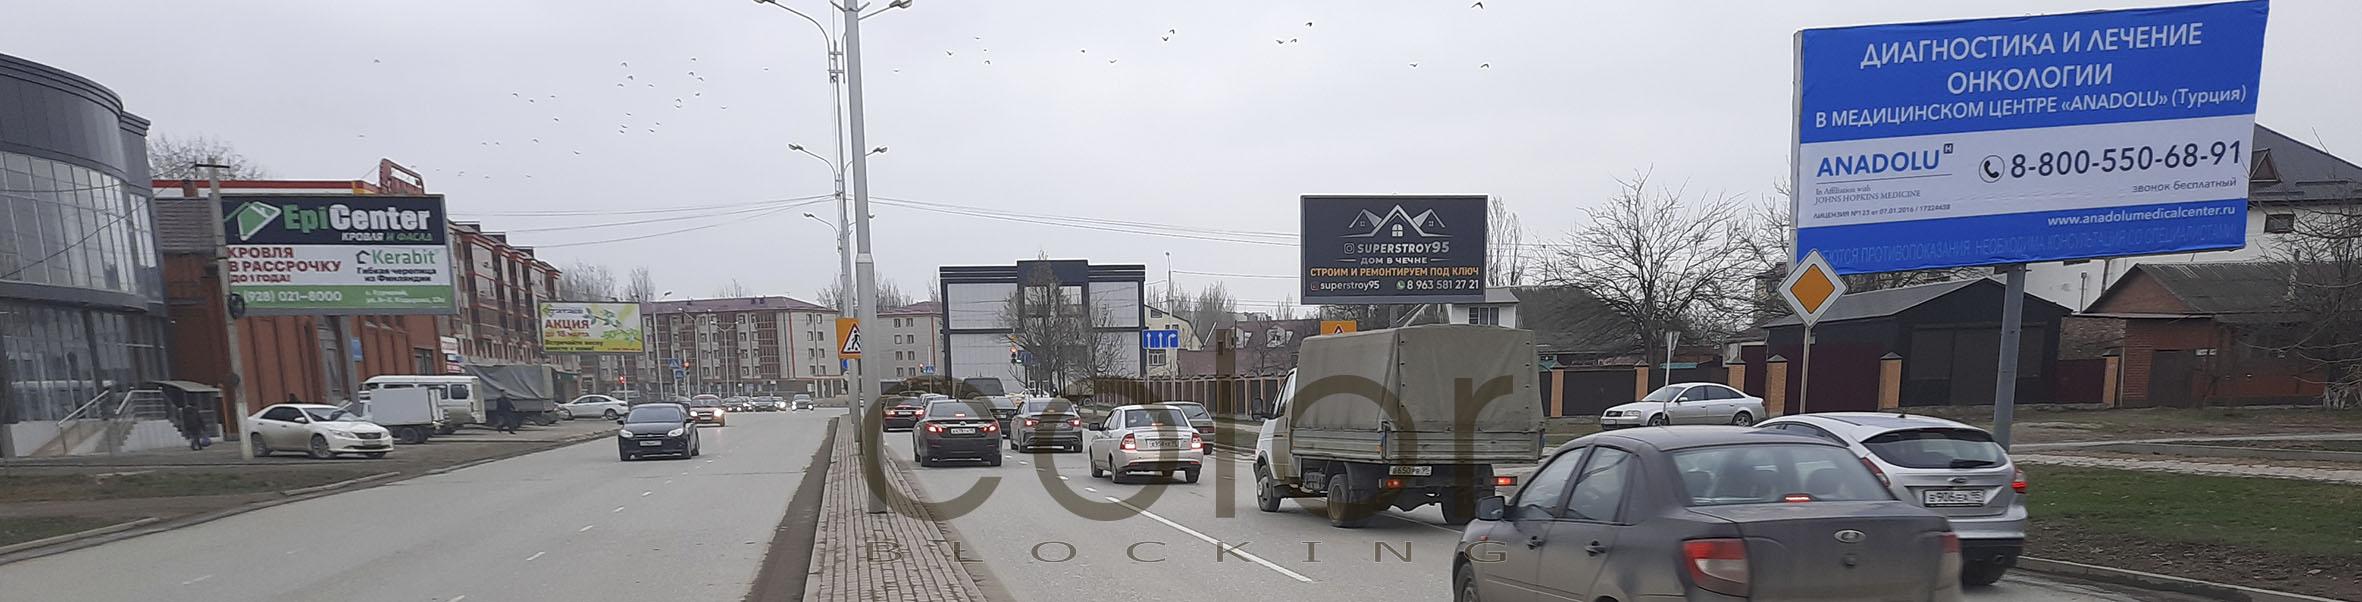 Рекламная кампания клиники Анадолу билборд